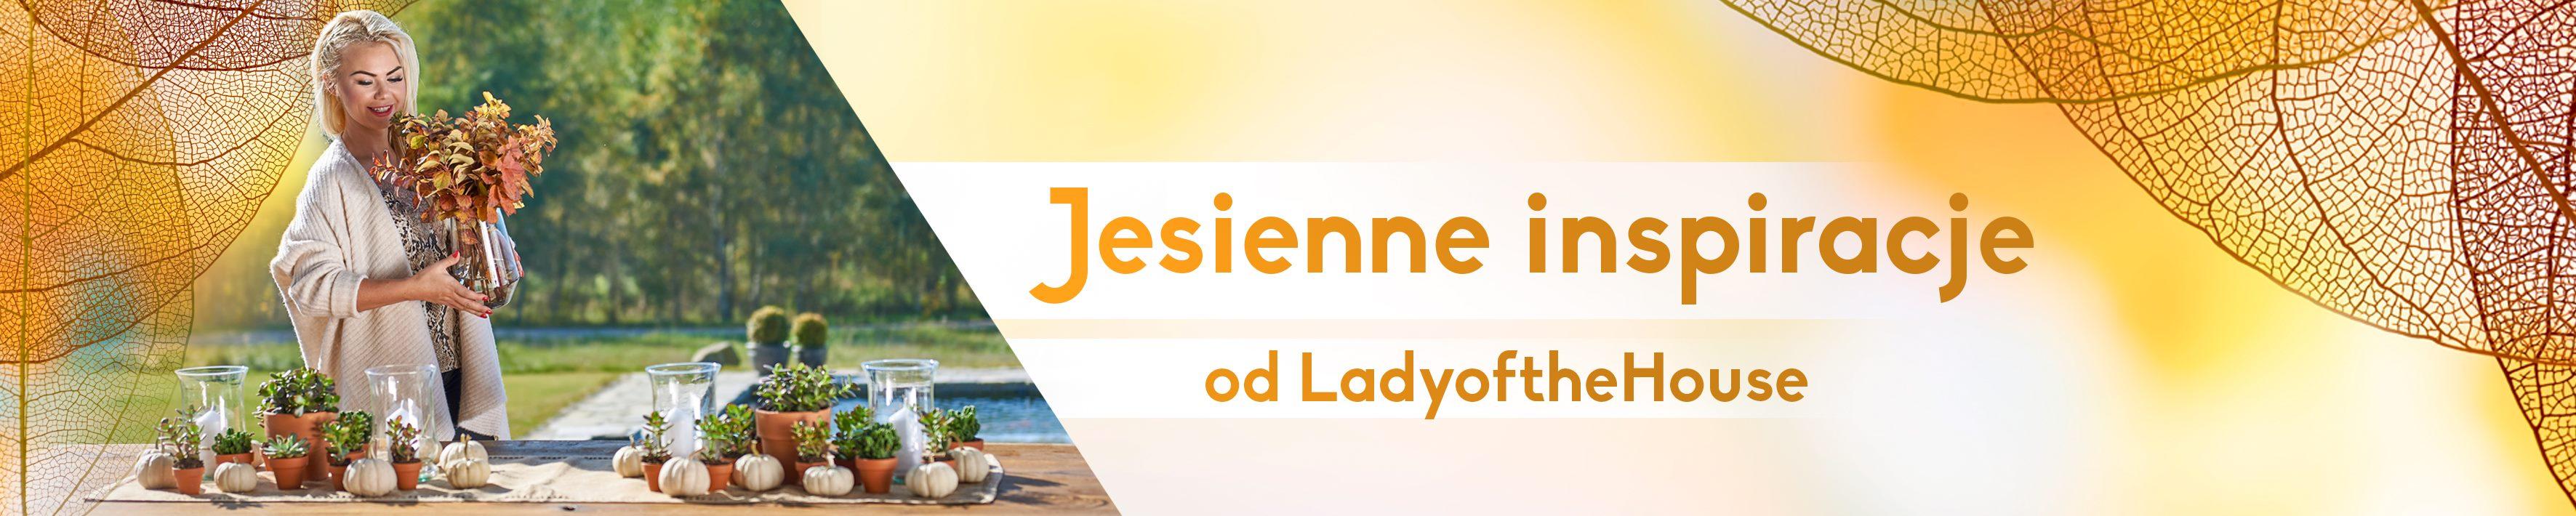 Jesienne inspiracje LadyofTheHouse